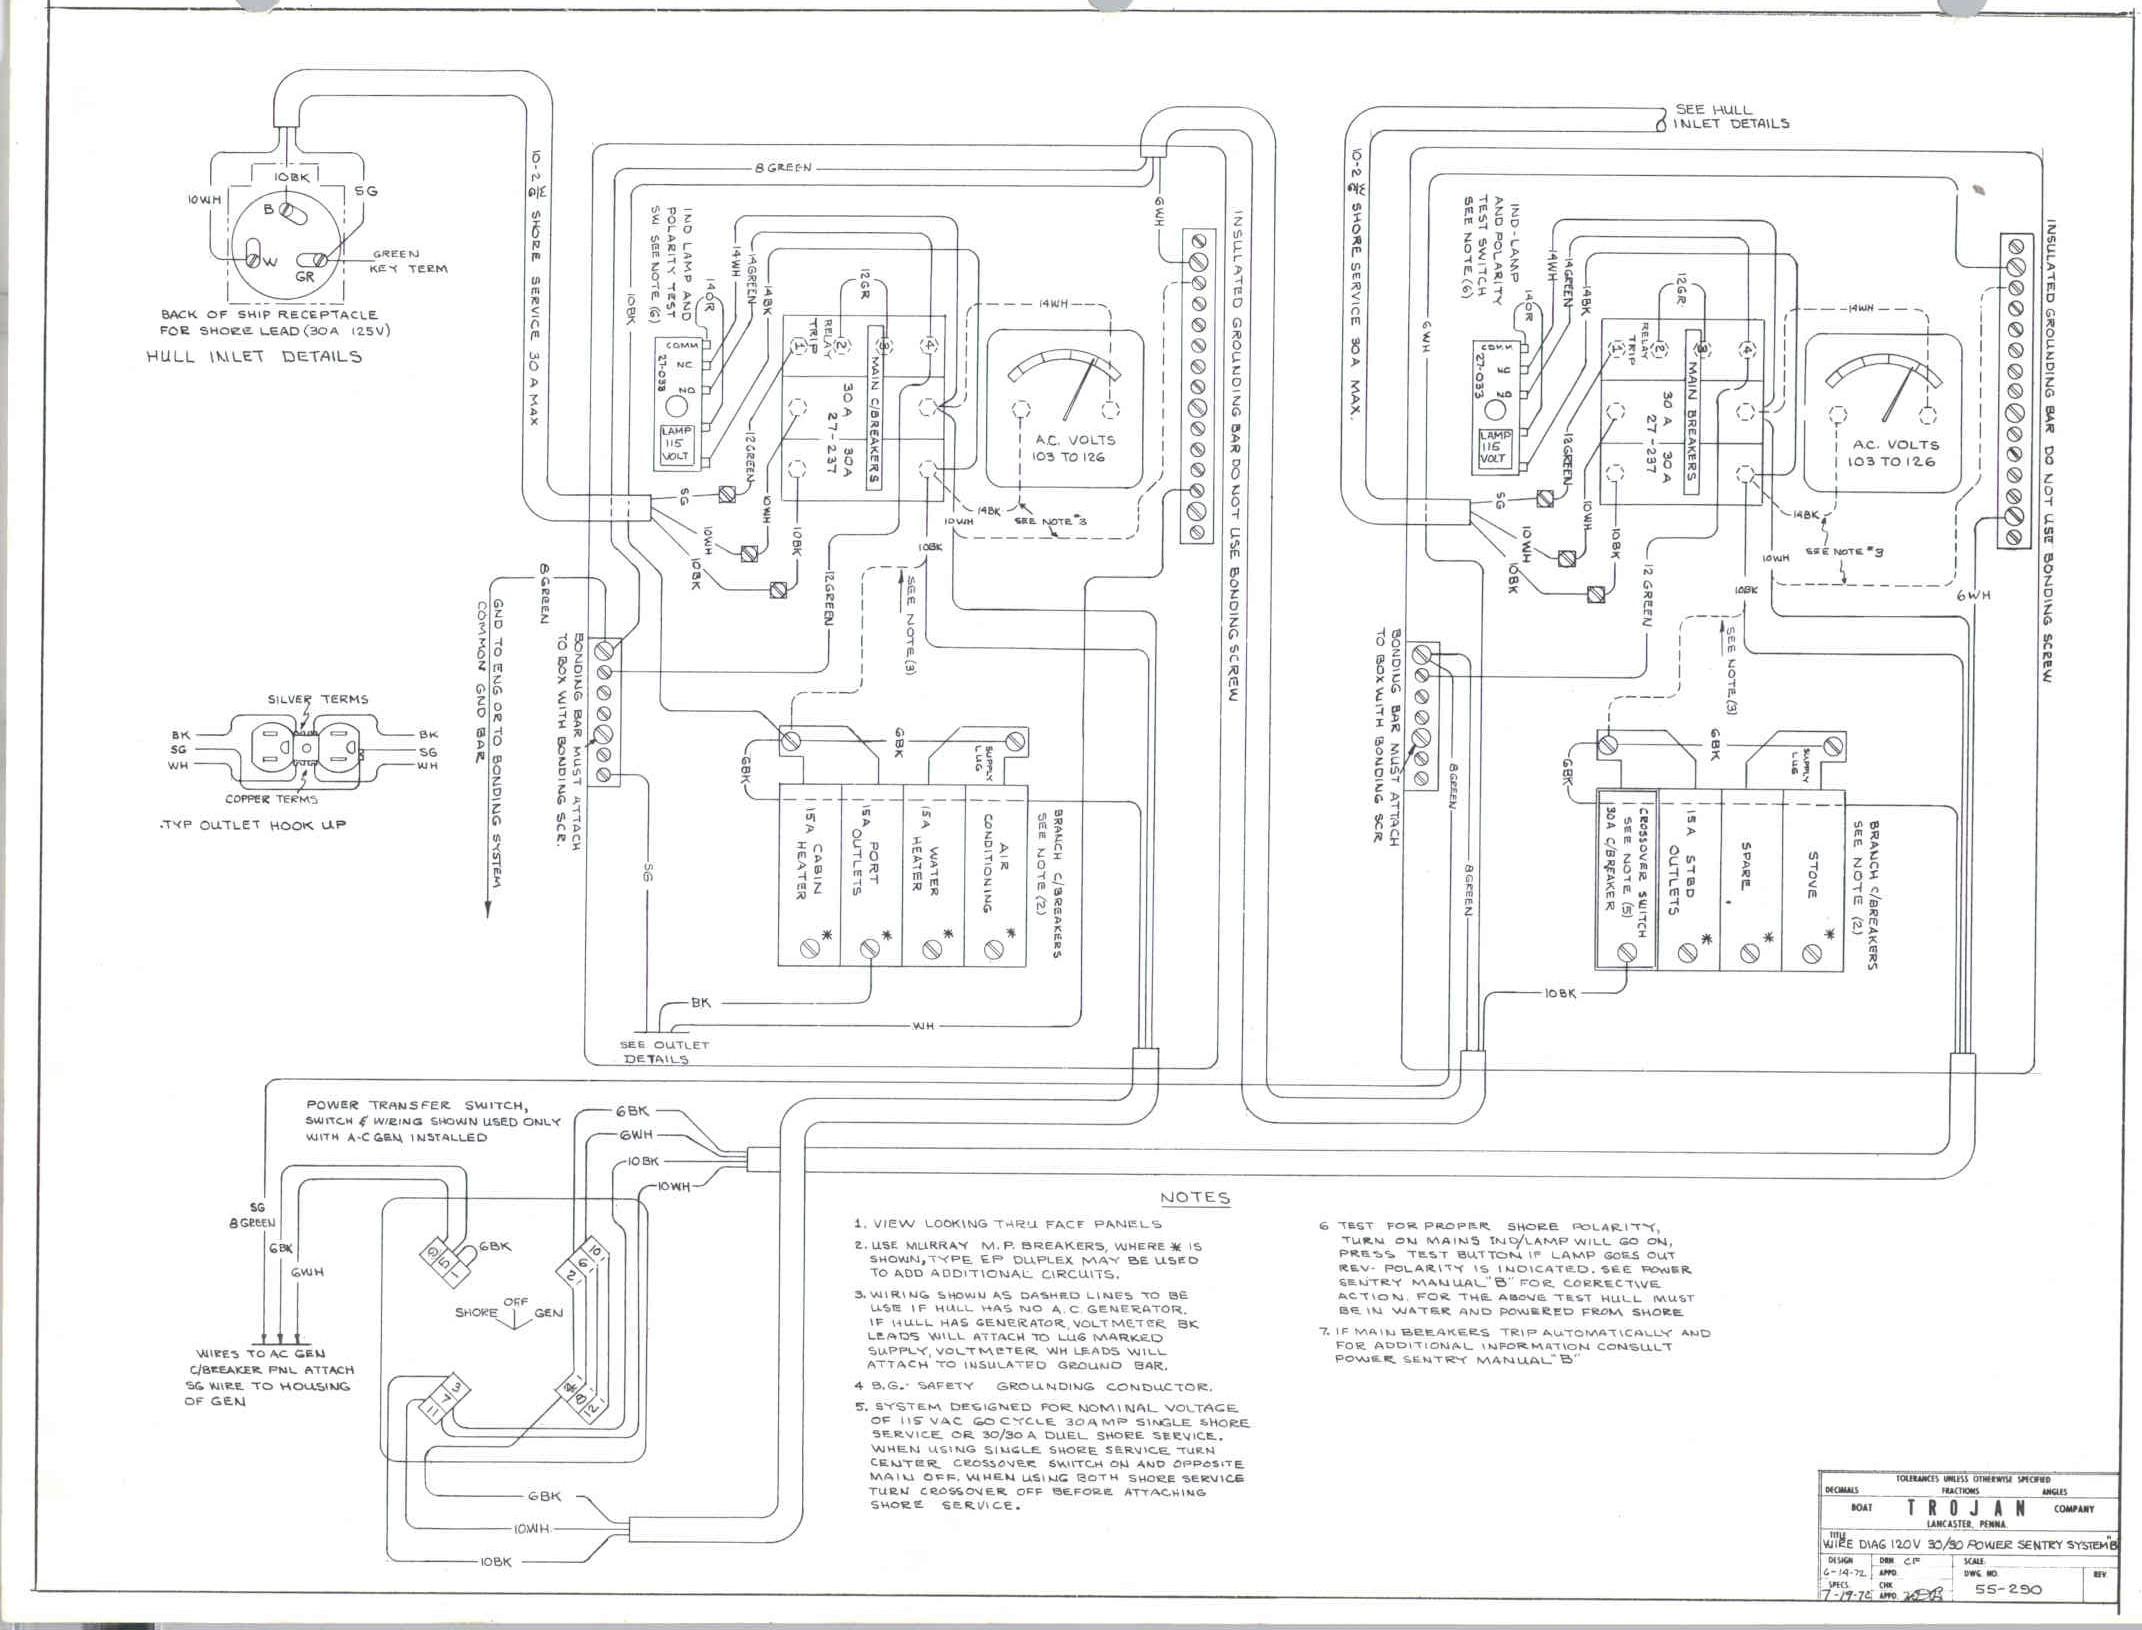 trojan treadmill wiring diagram   31 wiring diagram images